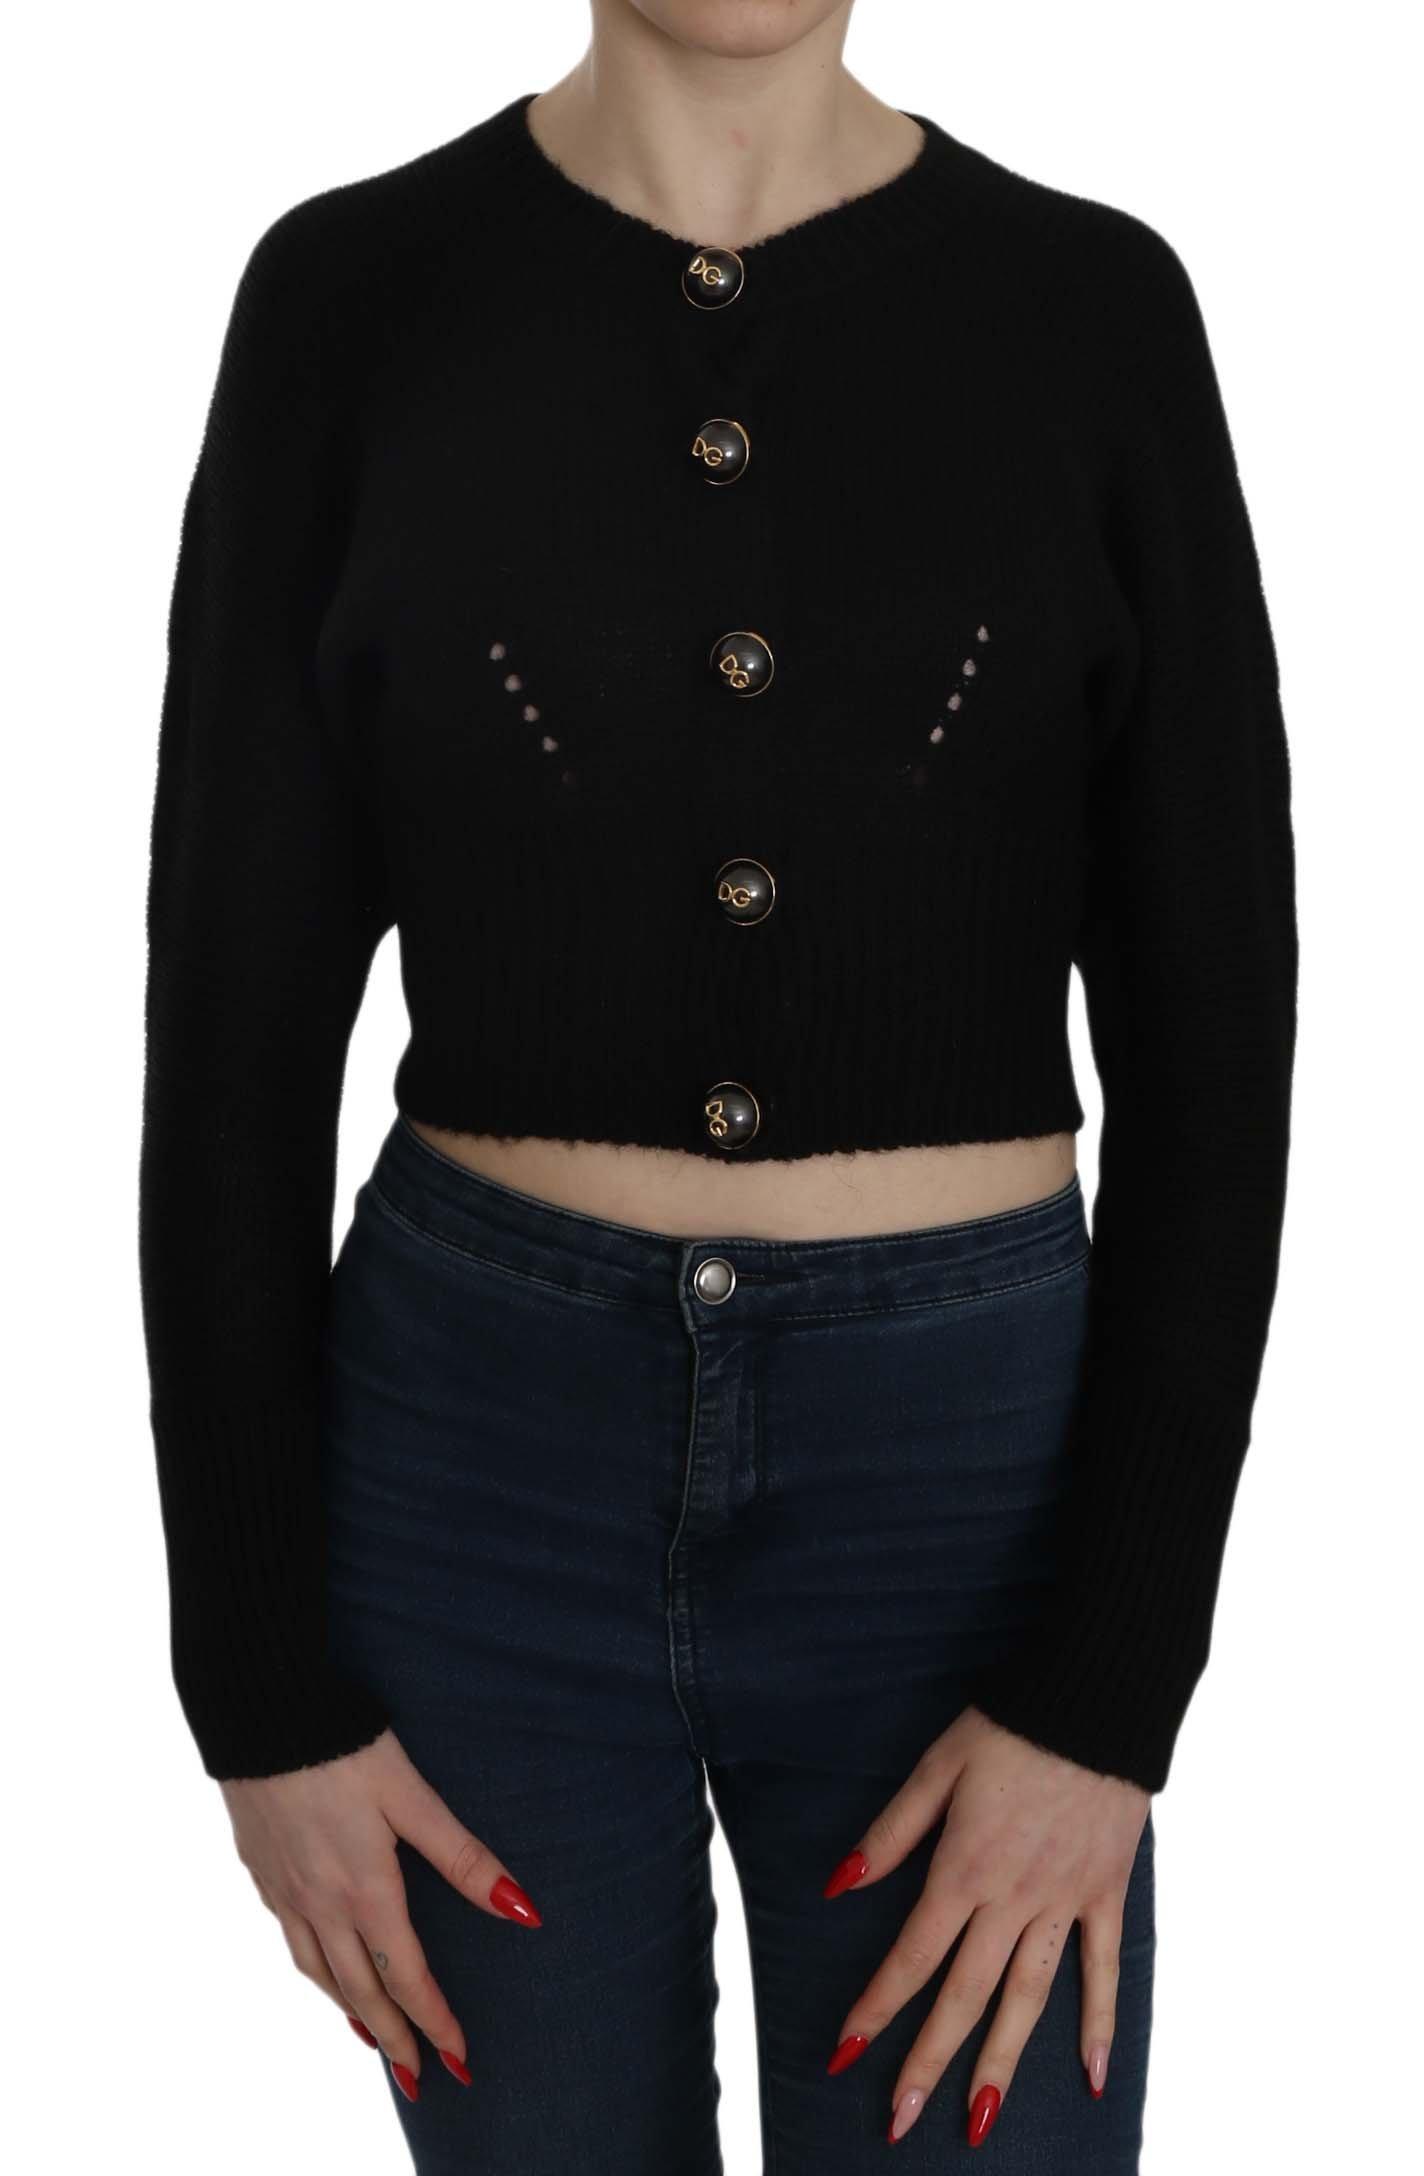 Dolce & Gabbana Women's Button Embellish Crop Cardigan Black TSH3714 - IT36|XXS